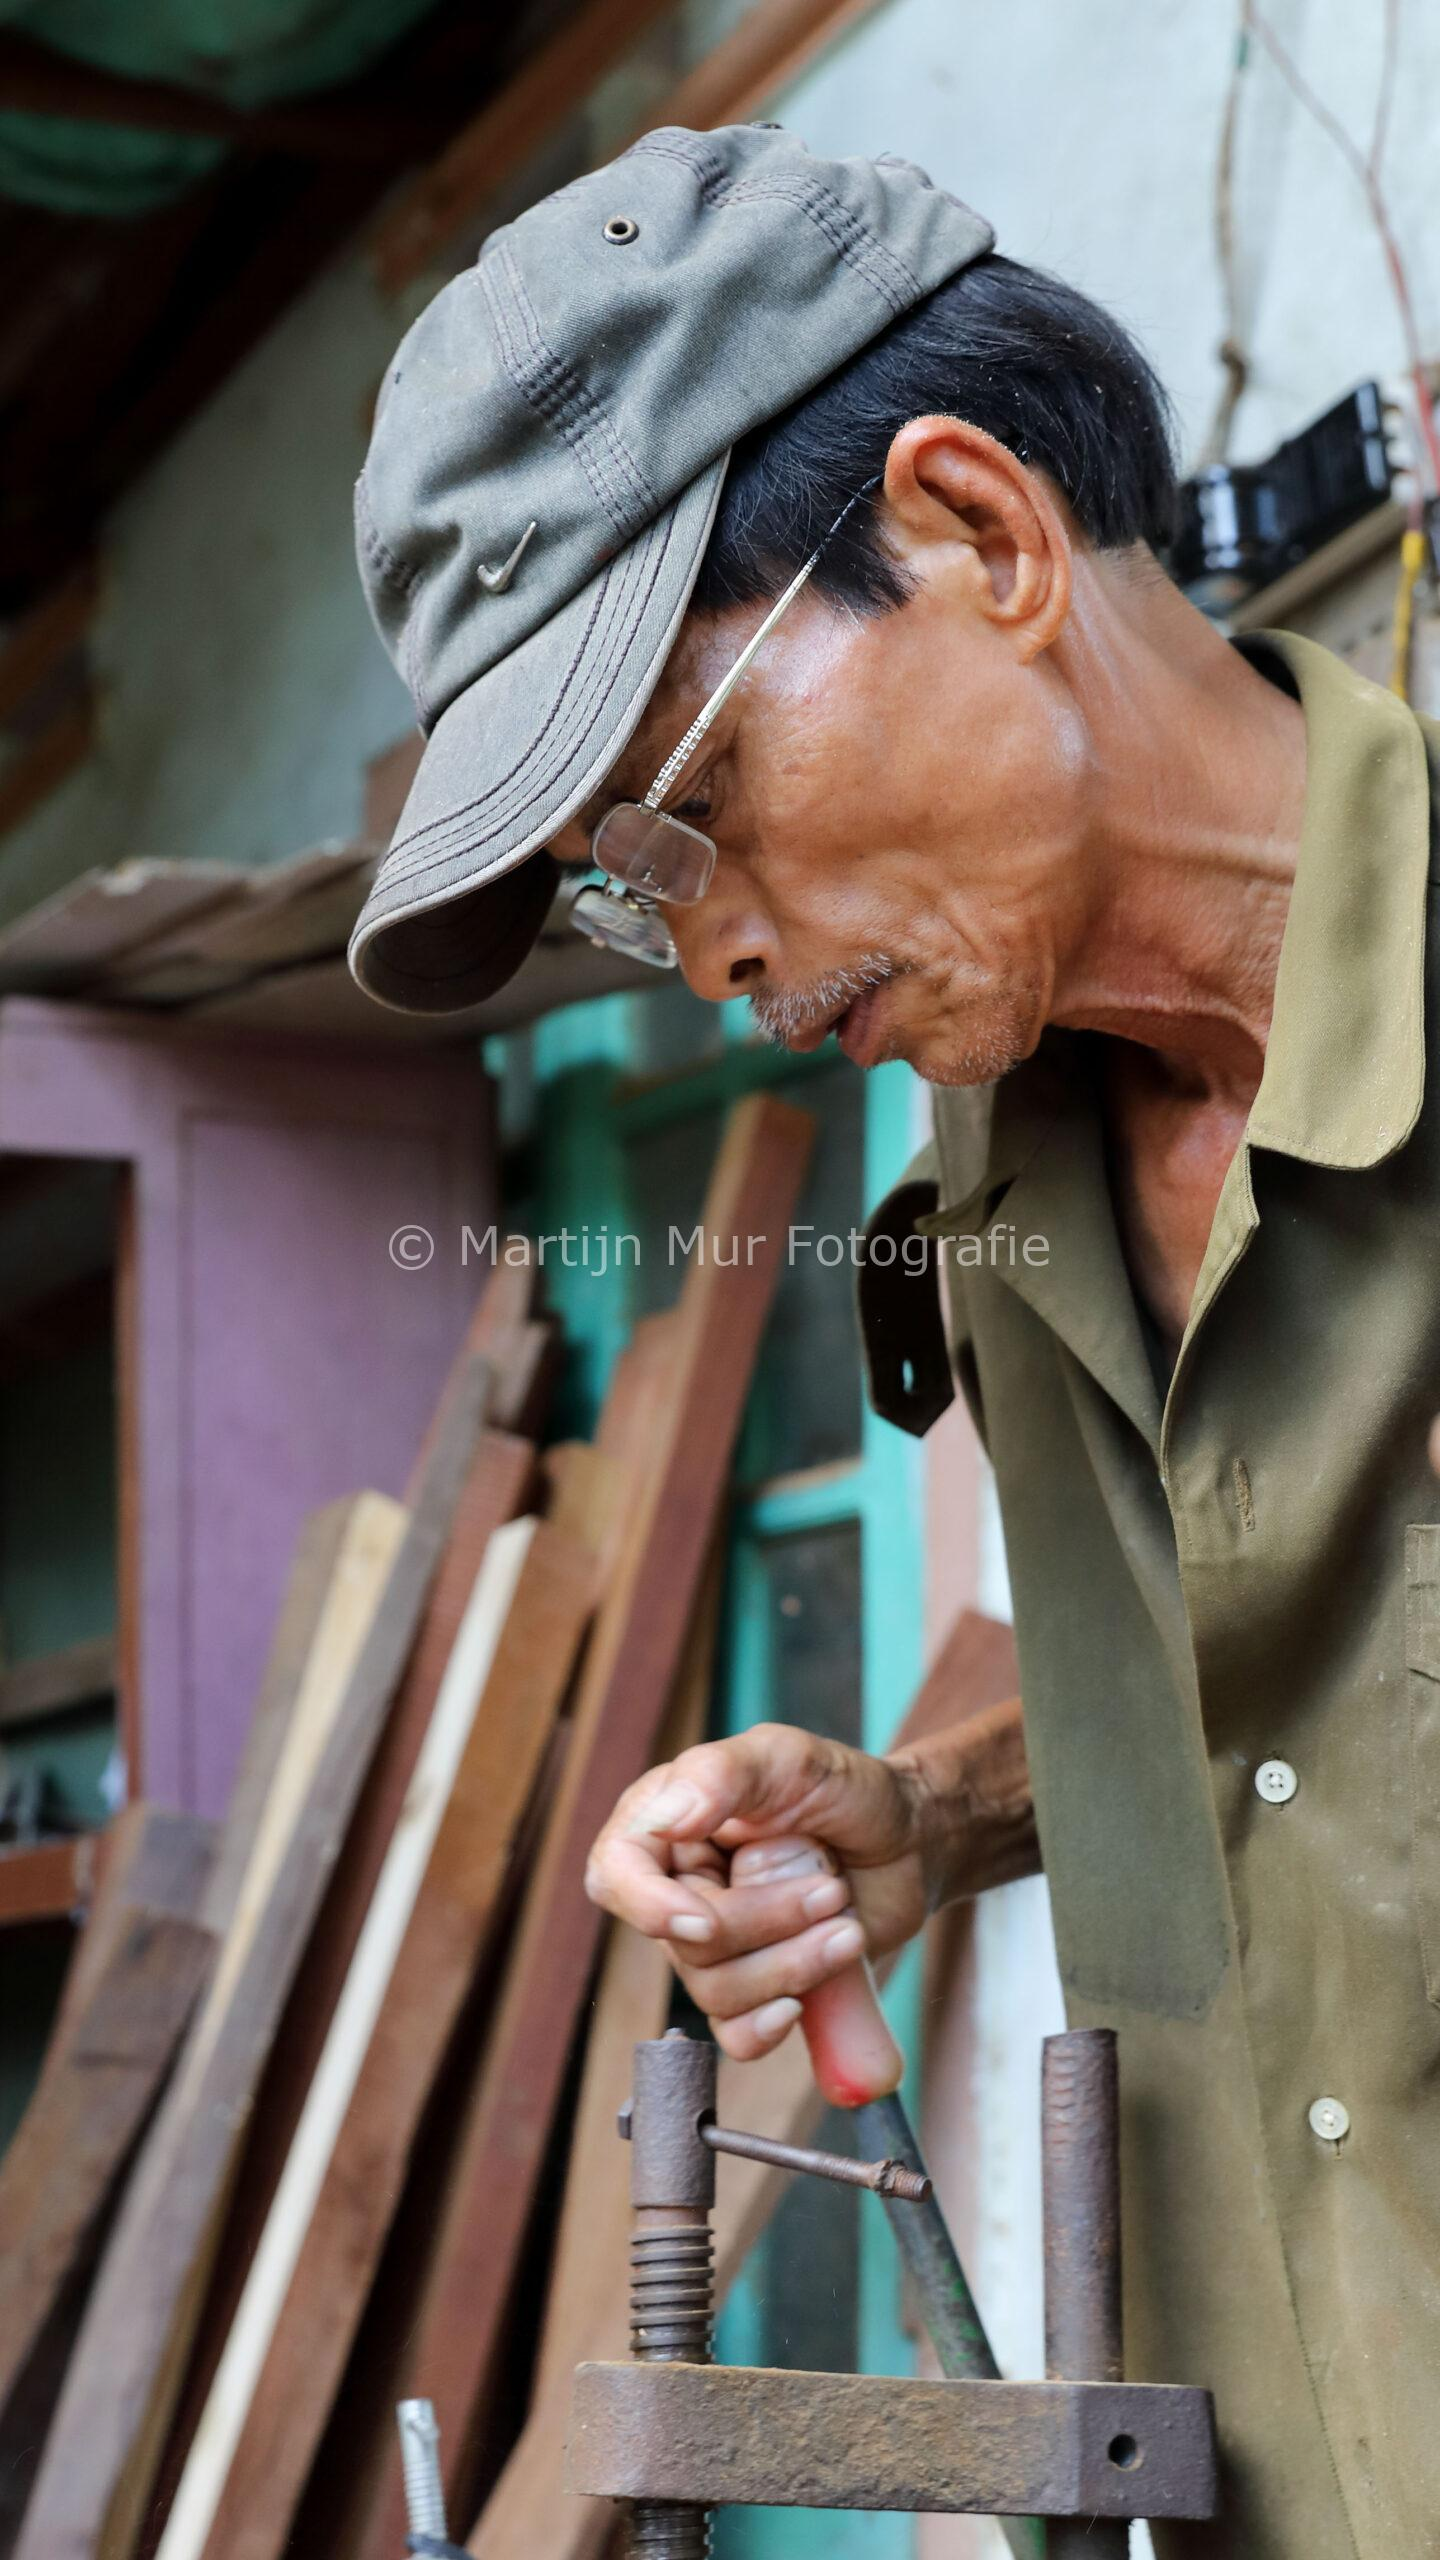 beroep in beeld, houtbewerker in Vietnam